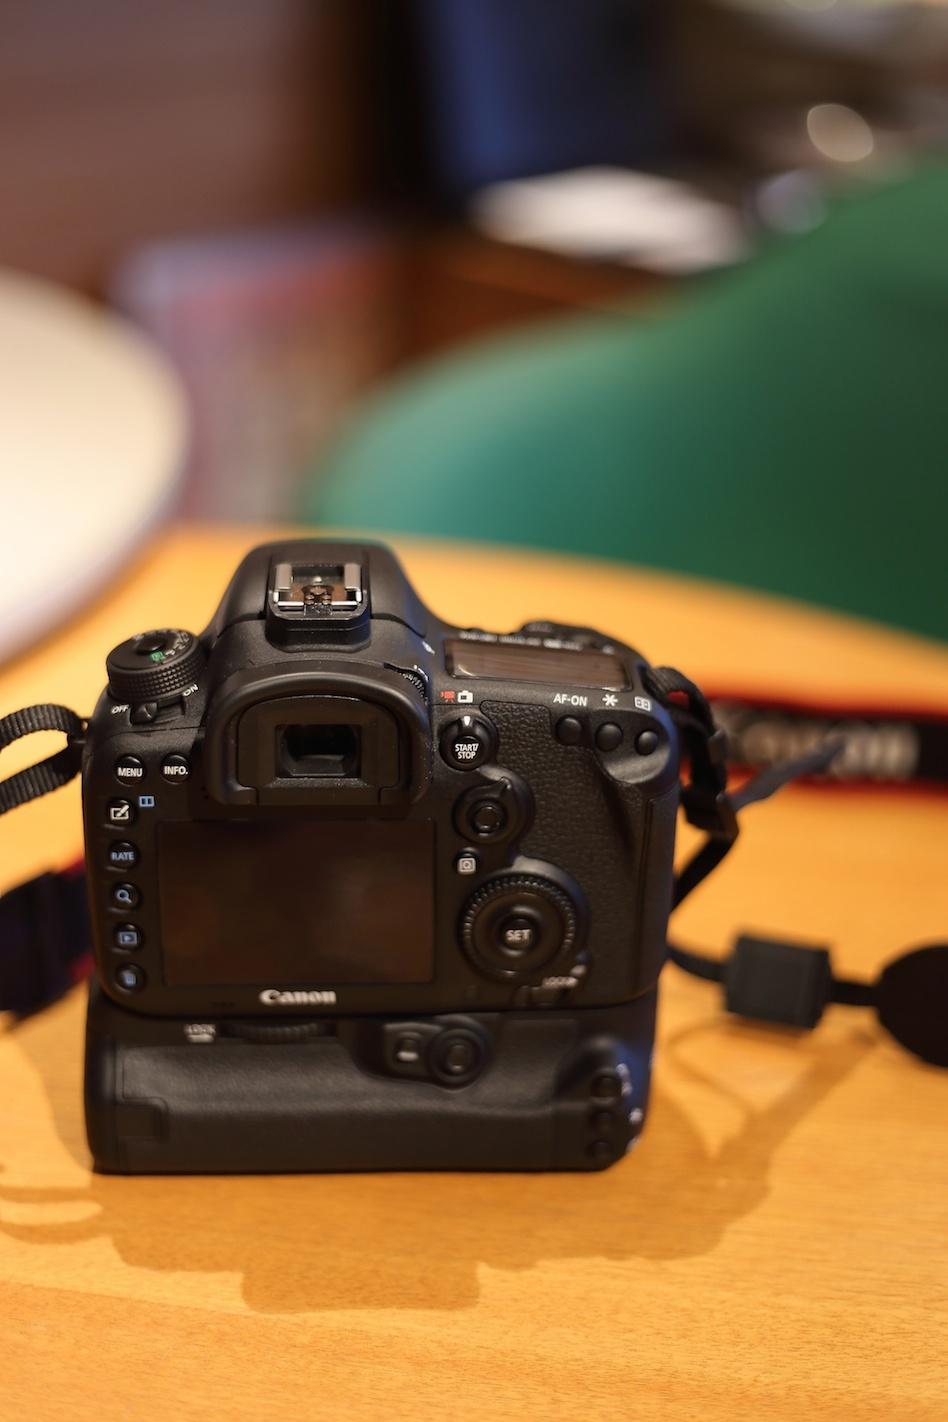 Canon EOS 7D Mark II GET BG(バッテリーグリップ)キャンペーン_d0081605_14332595.jpg